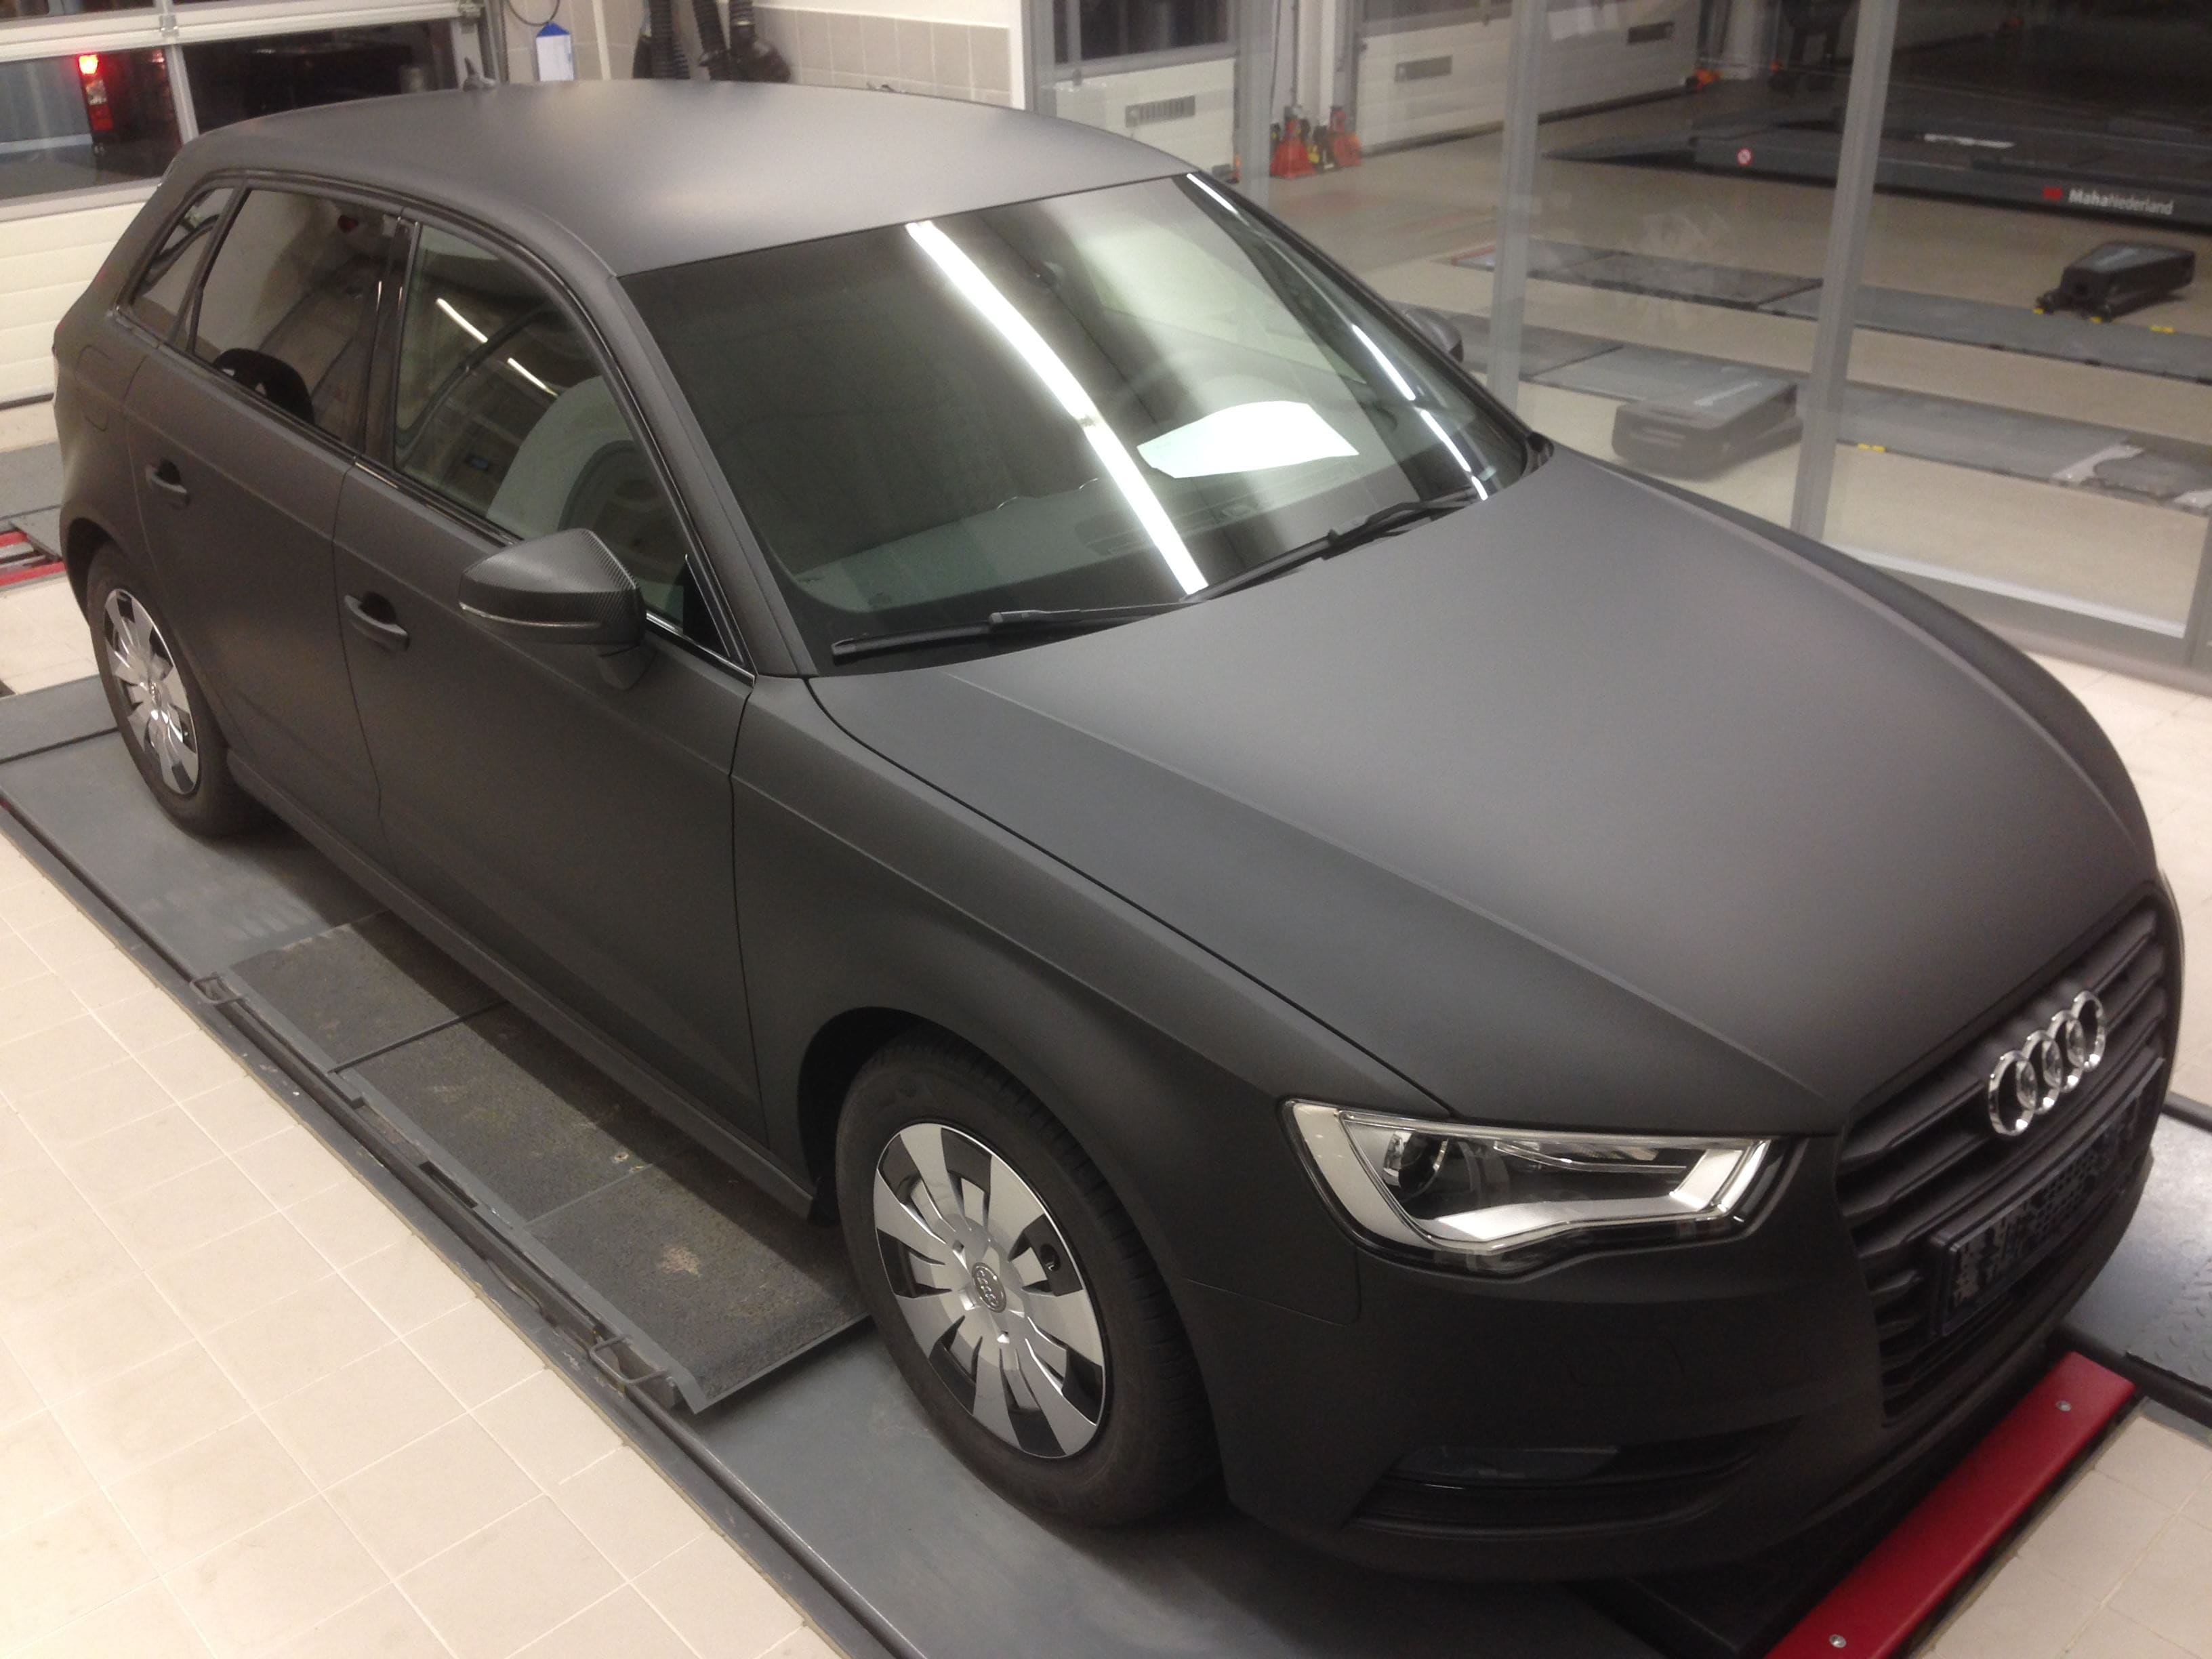 Audi A3 2014 met Mat Zwarte Wrap, Carwrapping door Wrapmyride.nu Foto-nr:4475, ©2021